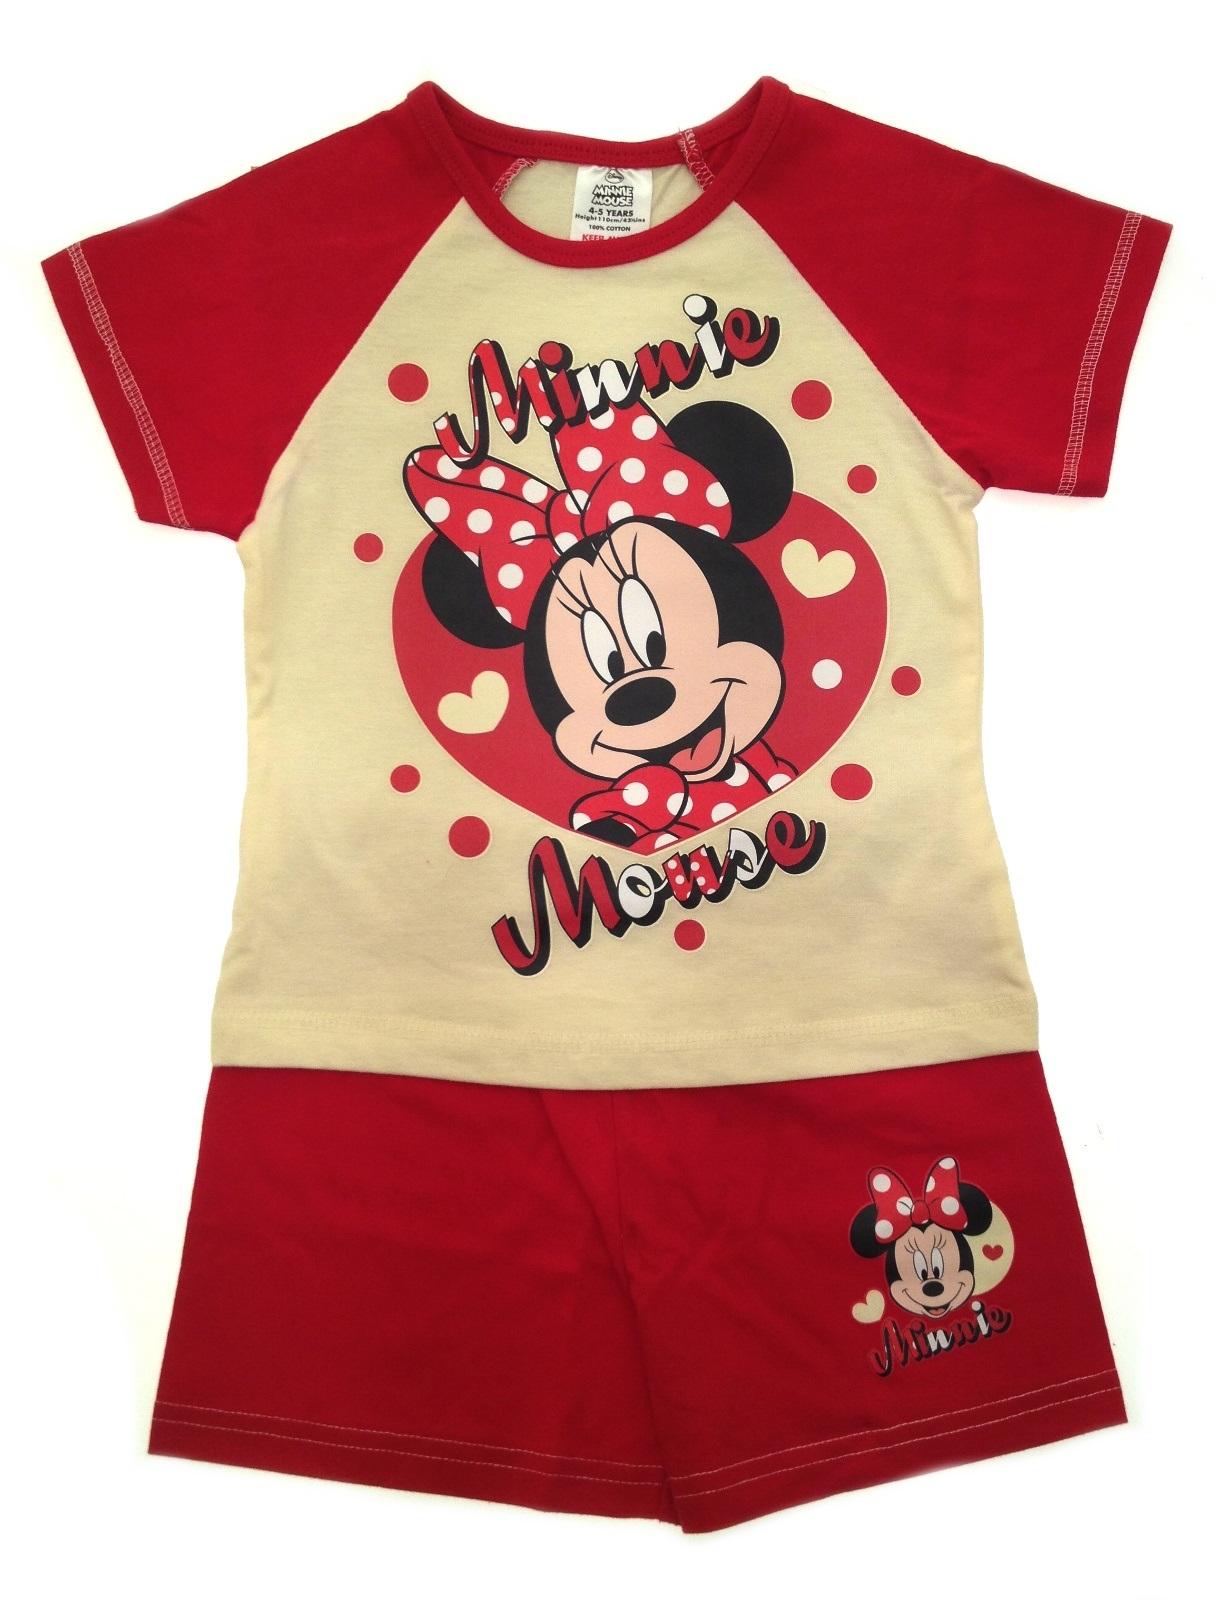 6d55d9055 Kids Girls Official Disney Minnie Mouse Short Pyjamas Pj s Set Size ...